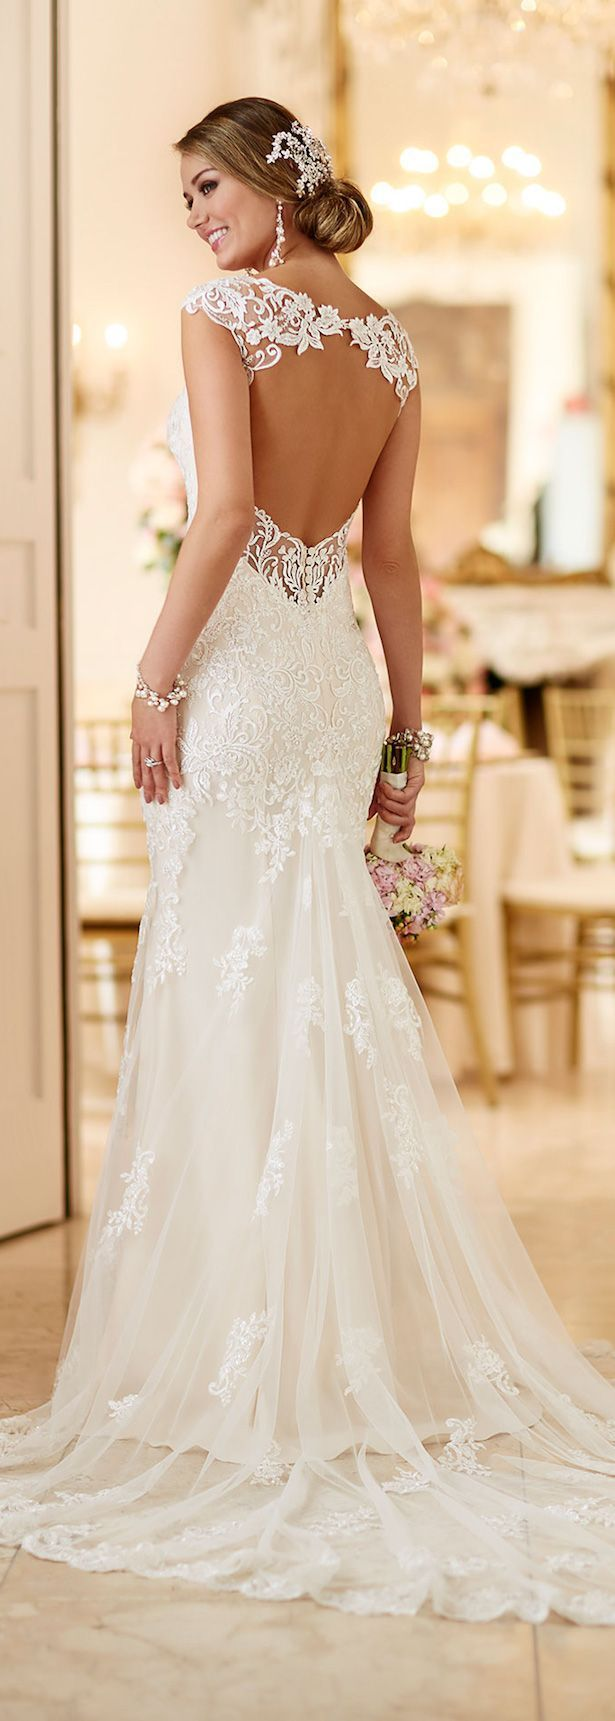 Stella York Spring 2016 Wedding Dress #vestidodenovia | #trajesdenovio | vestidos de novia para gorditas | vestidos de novia cortos http://amzn.to/29aGZWo